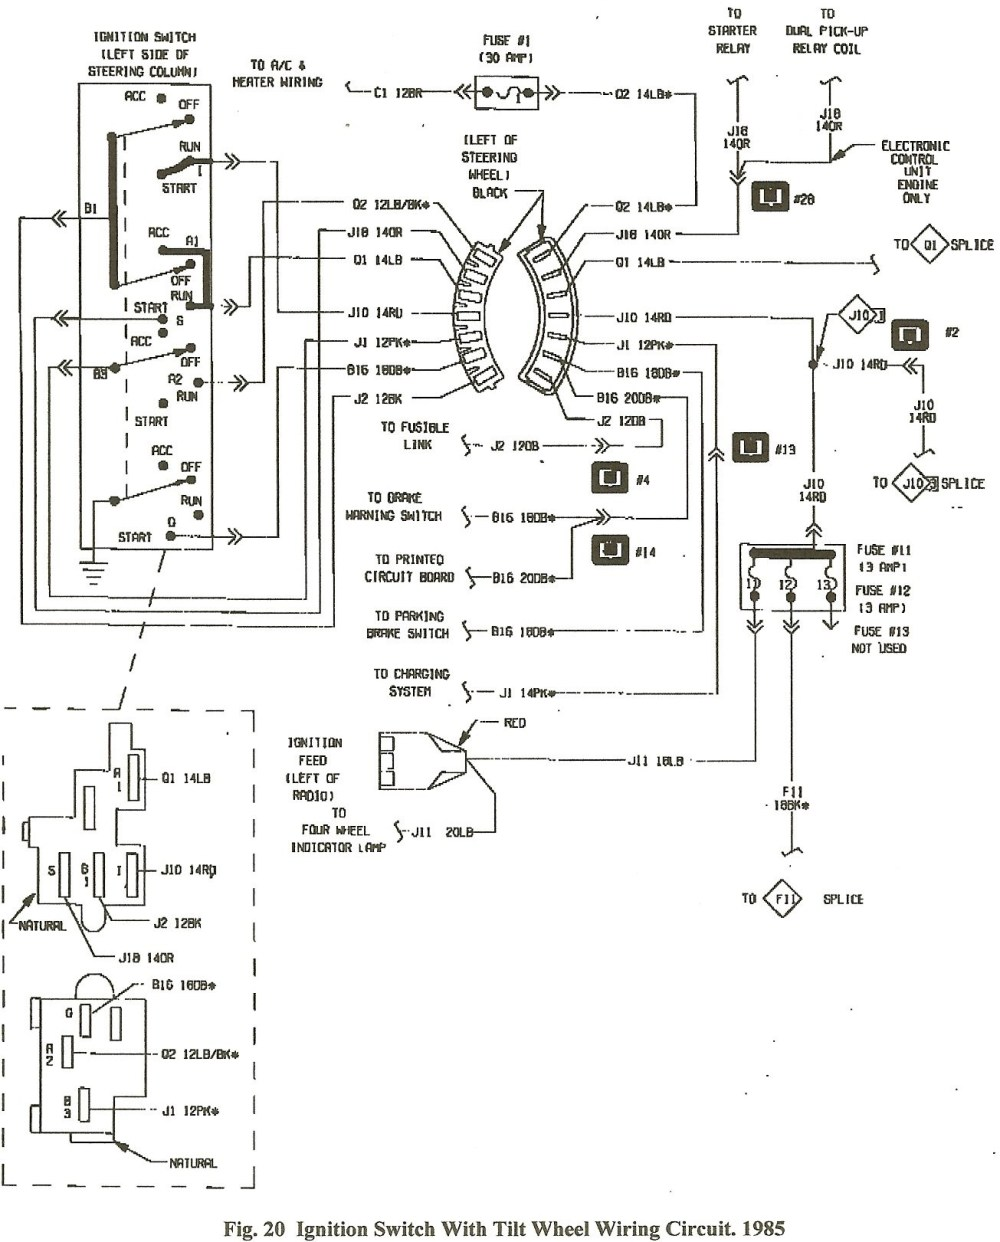 medium resolution of 1992 dodge dakota ignition system wiring diagram free download rh oasis dl co basic ignition wiring